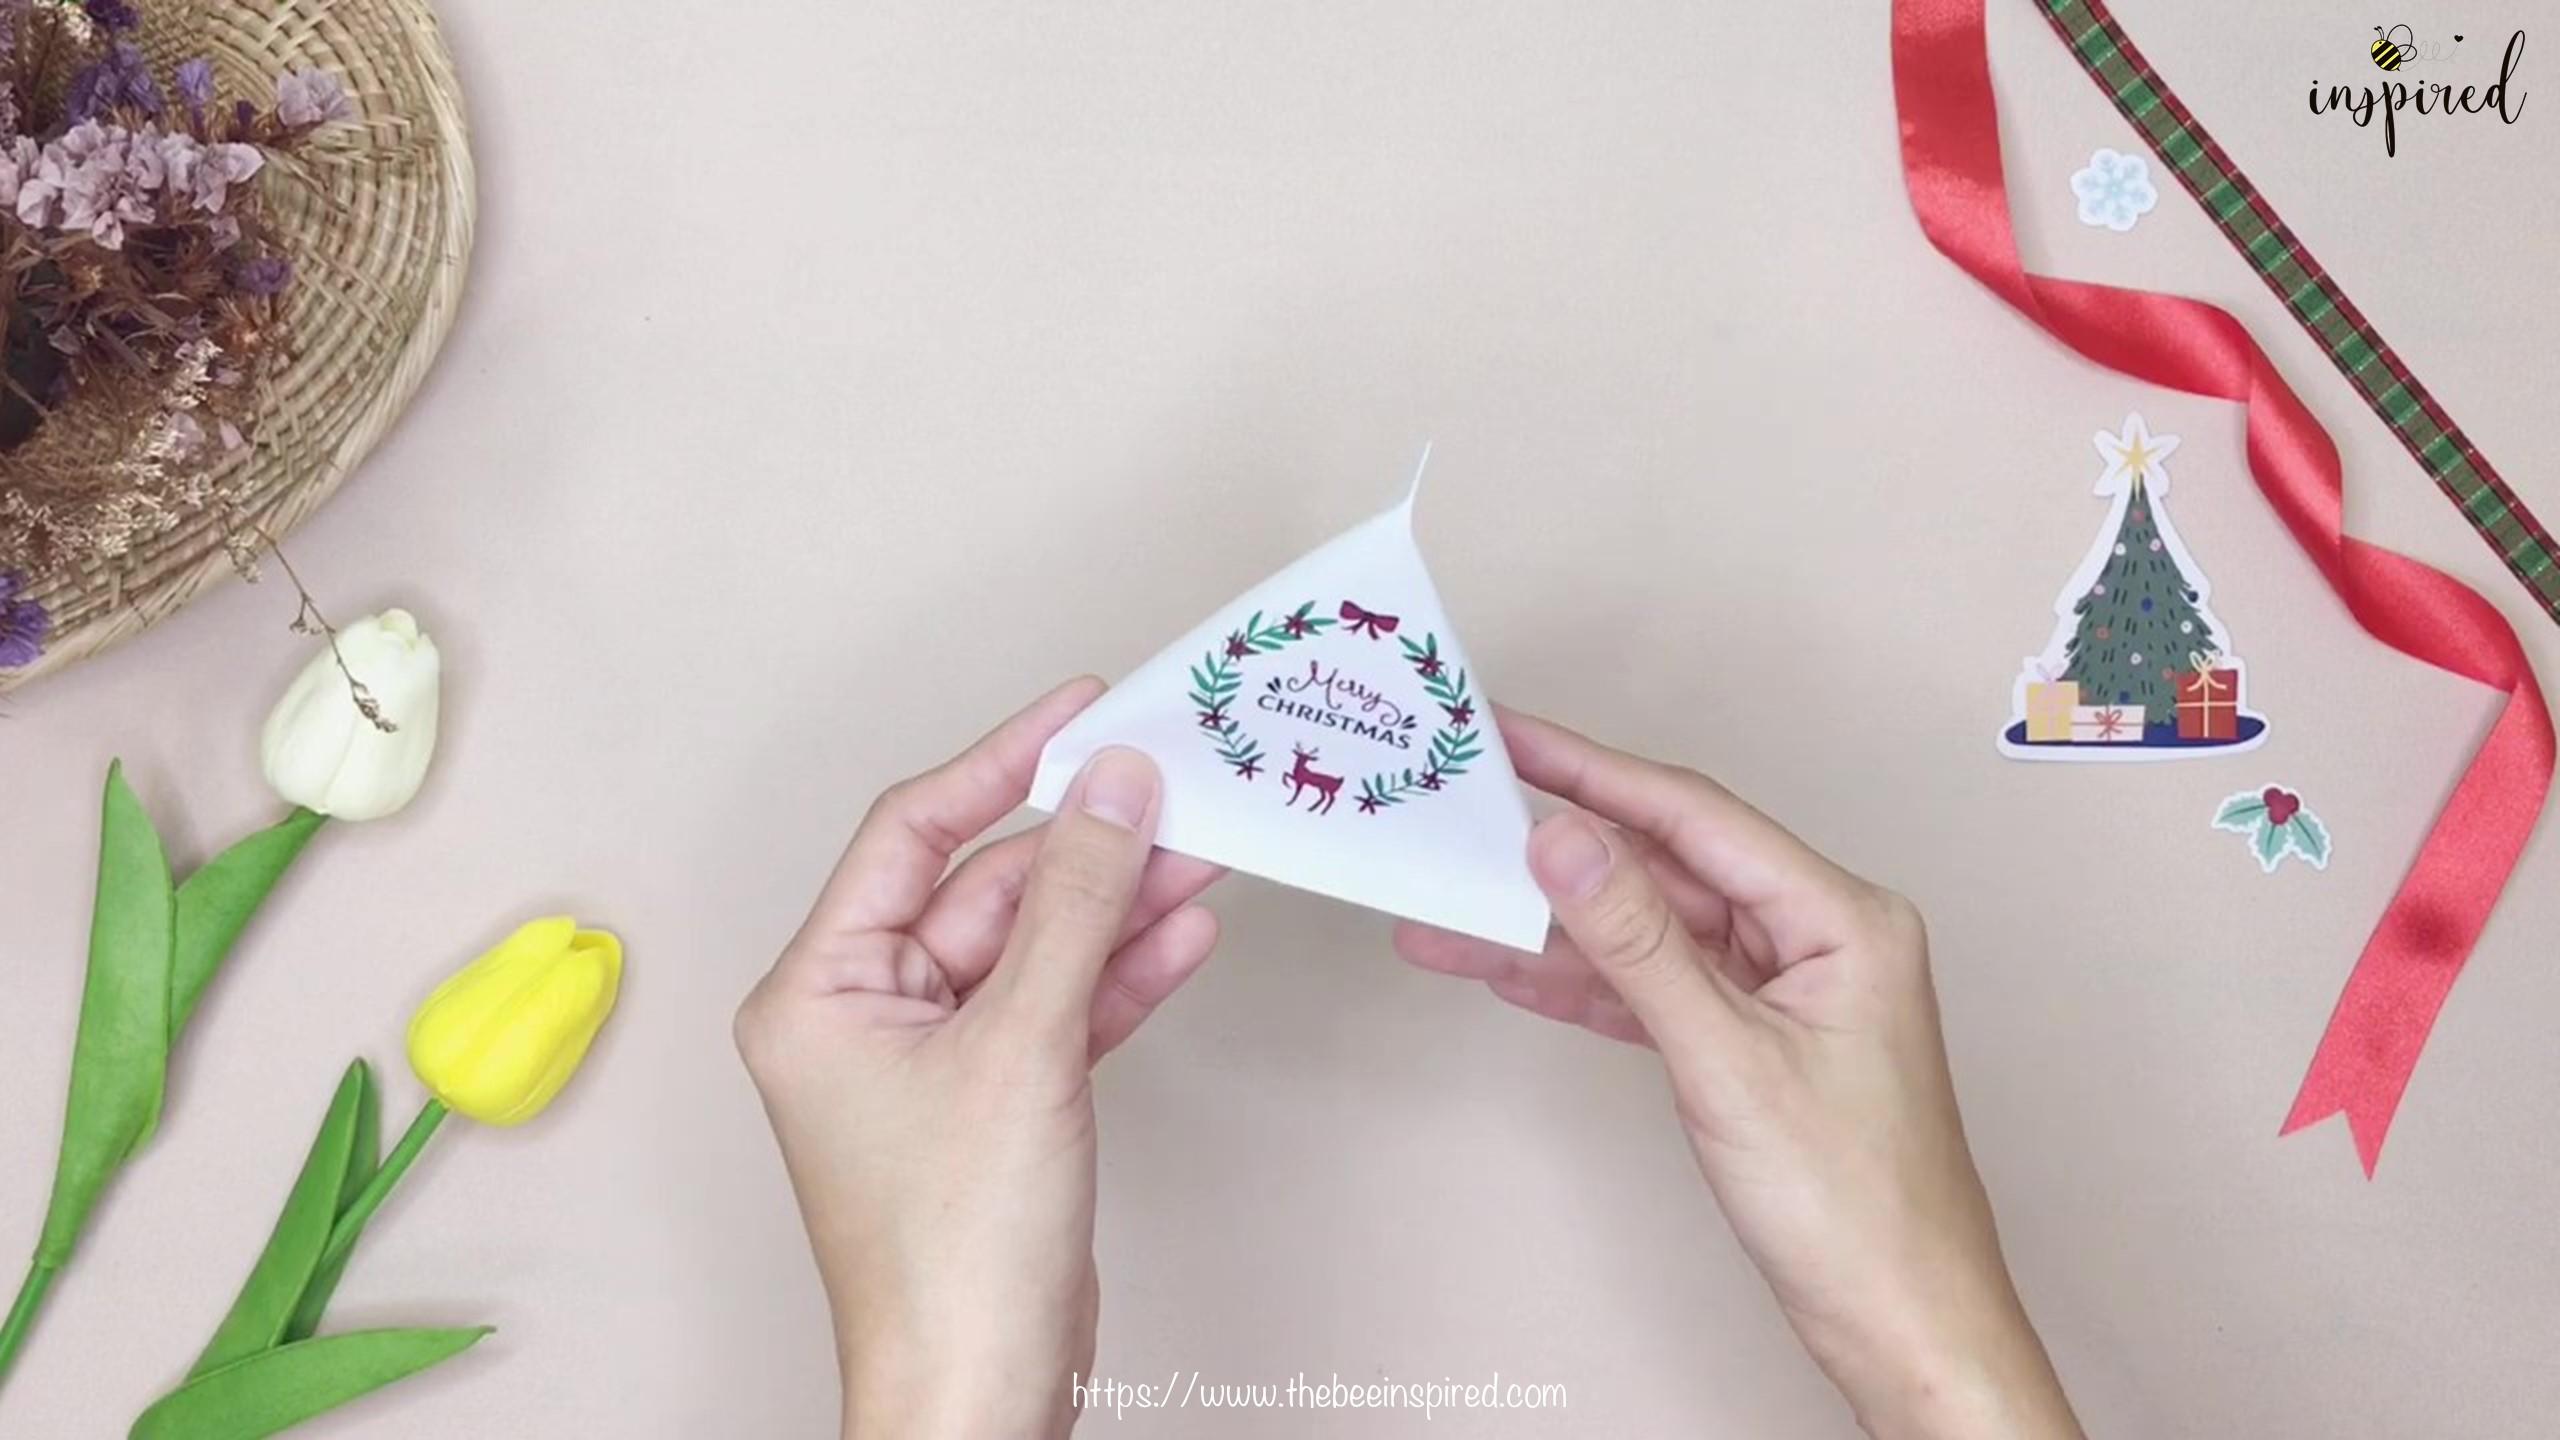 DIY วิธีทำถุงของขวัญวันวาเลนไทน์สามเหลี่ยม_ How to Wrap Gift in Triangle Shape for Valentine_9